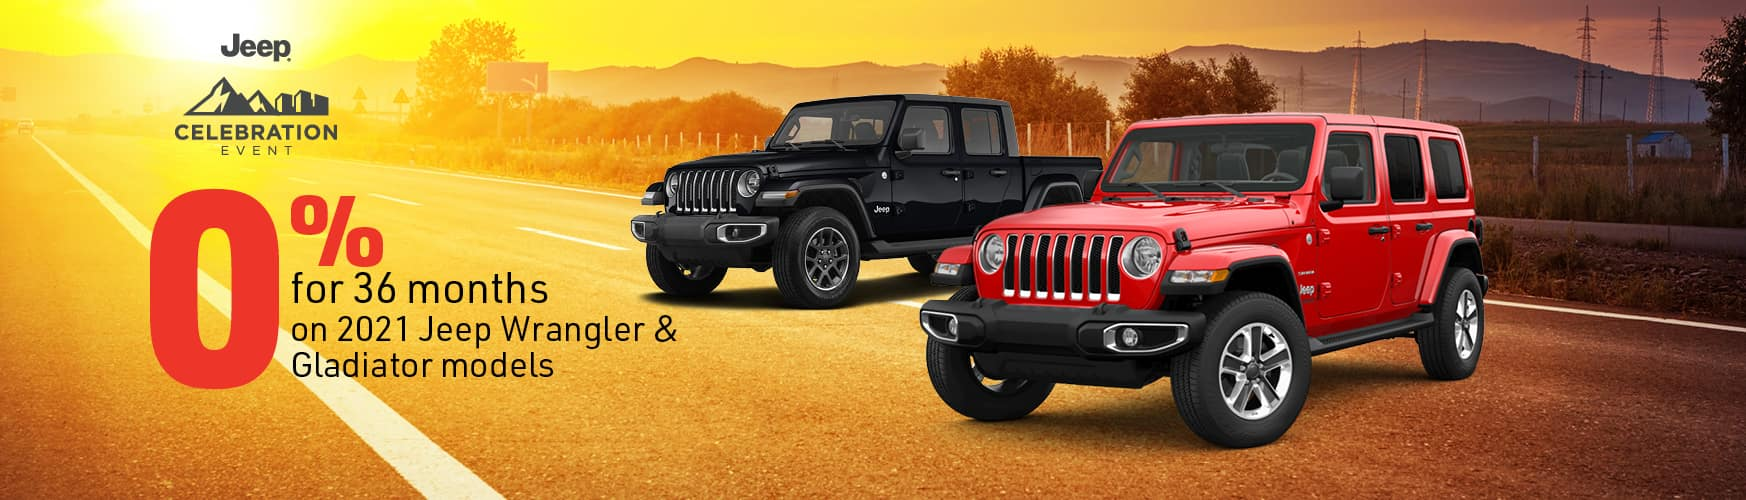 0% for 36 months on 2021 Jeep Wrangler & Gladiator models